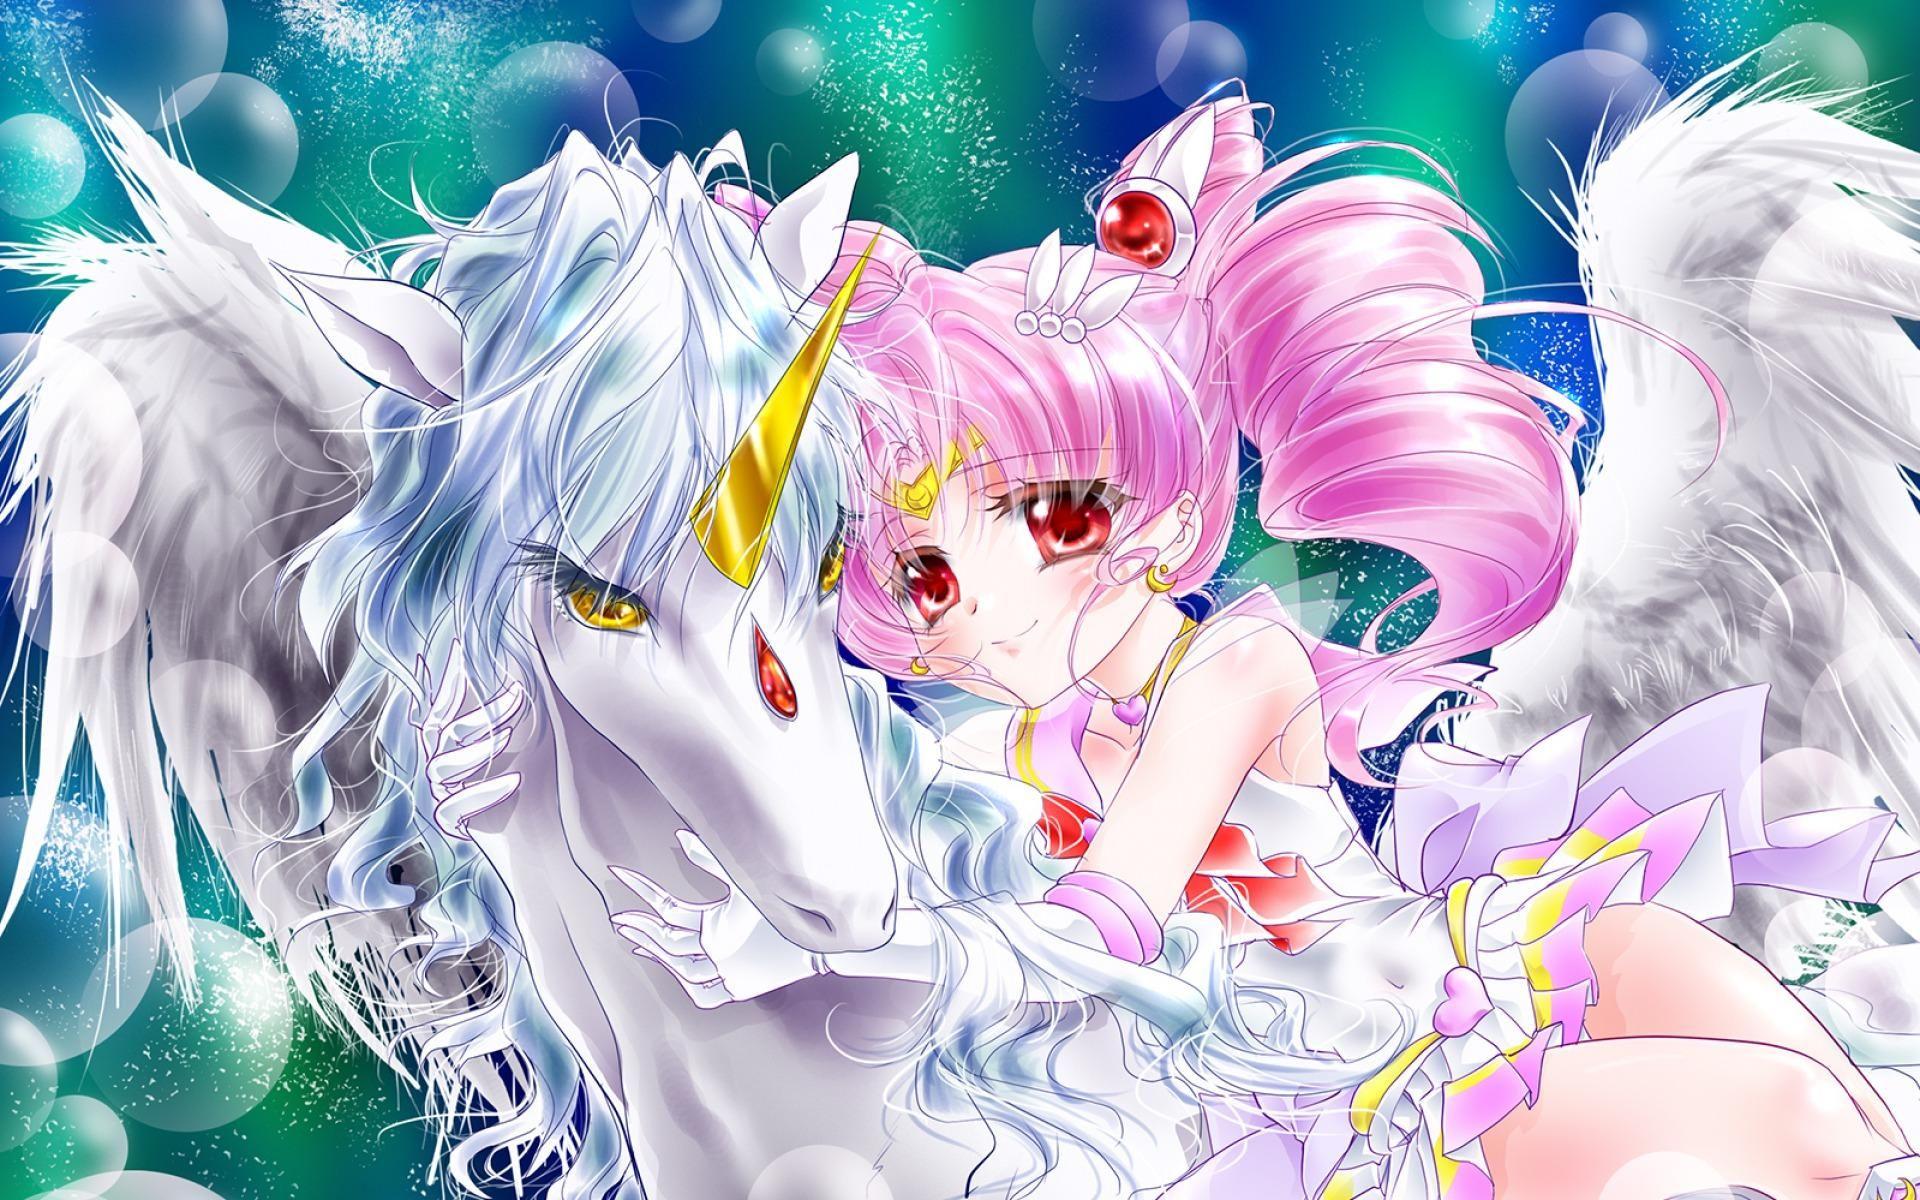 25 Cute Unicorn Anime Wallpaper Anime Top Wallpaper Sailor Moon Wallpaper Sailor Mini Moon Sailor Chibi Moon